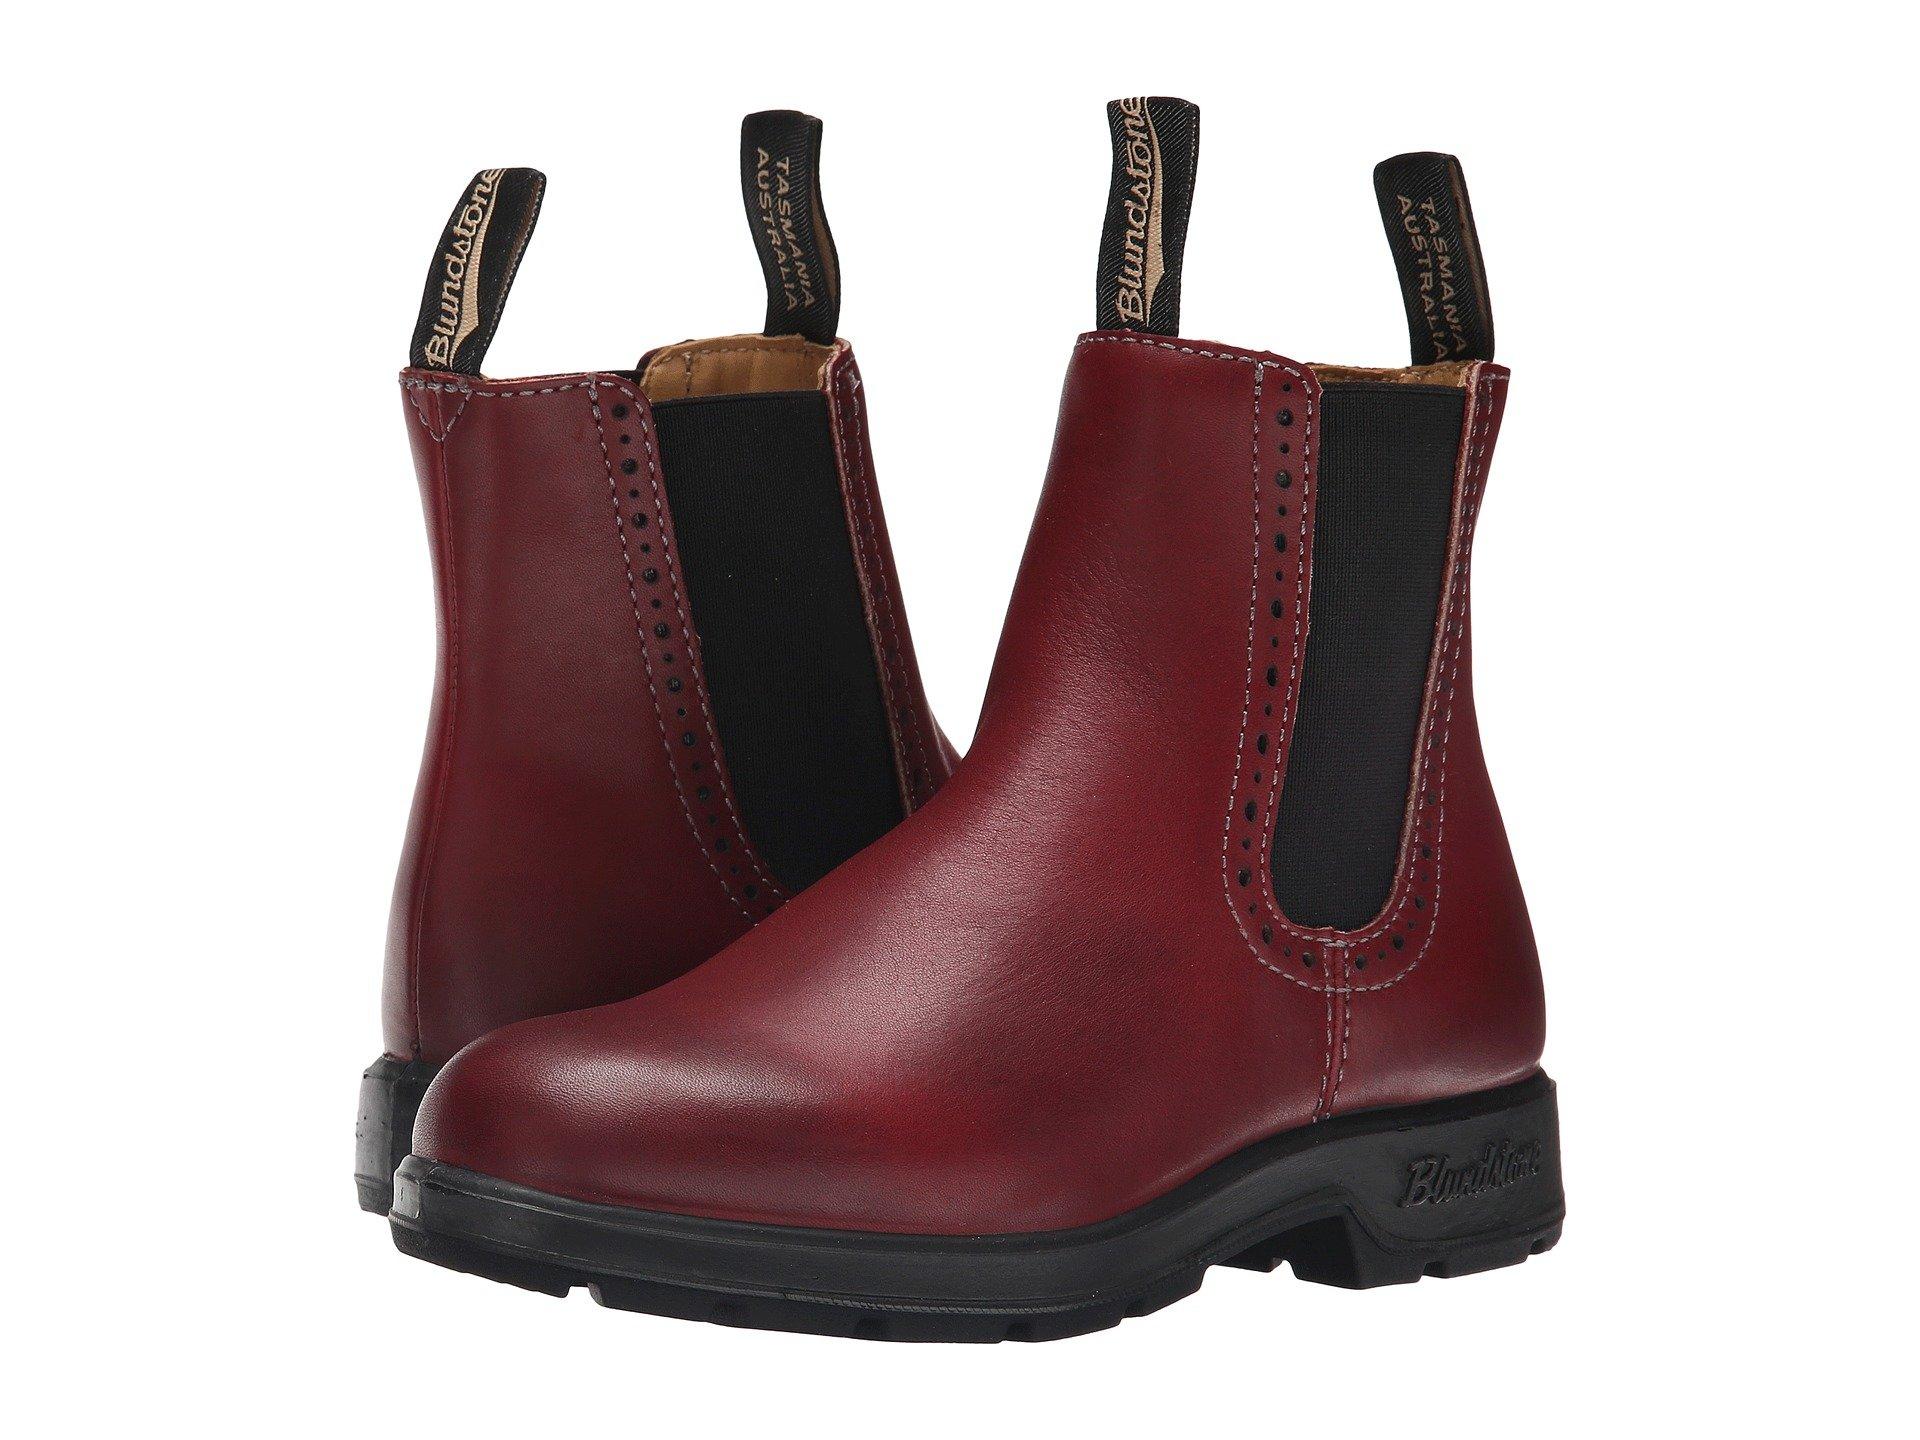 Ys by Yohji Yamamoto Side Gore Heel Boots   niIX6v5T